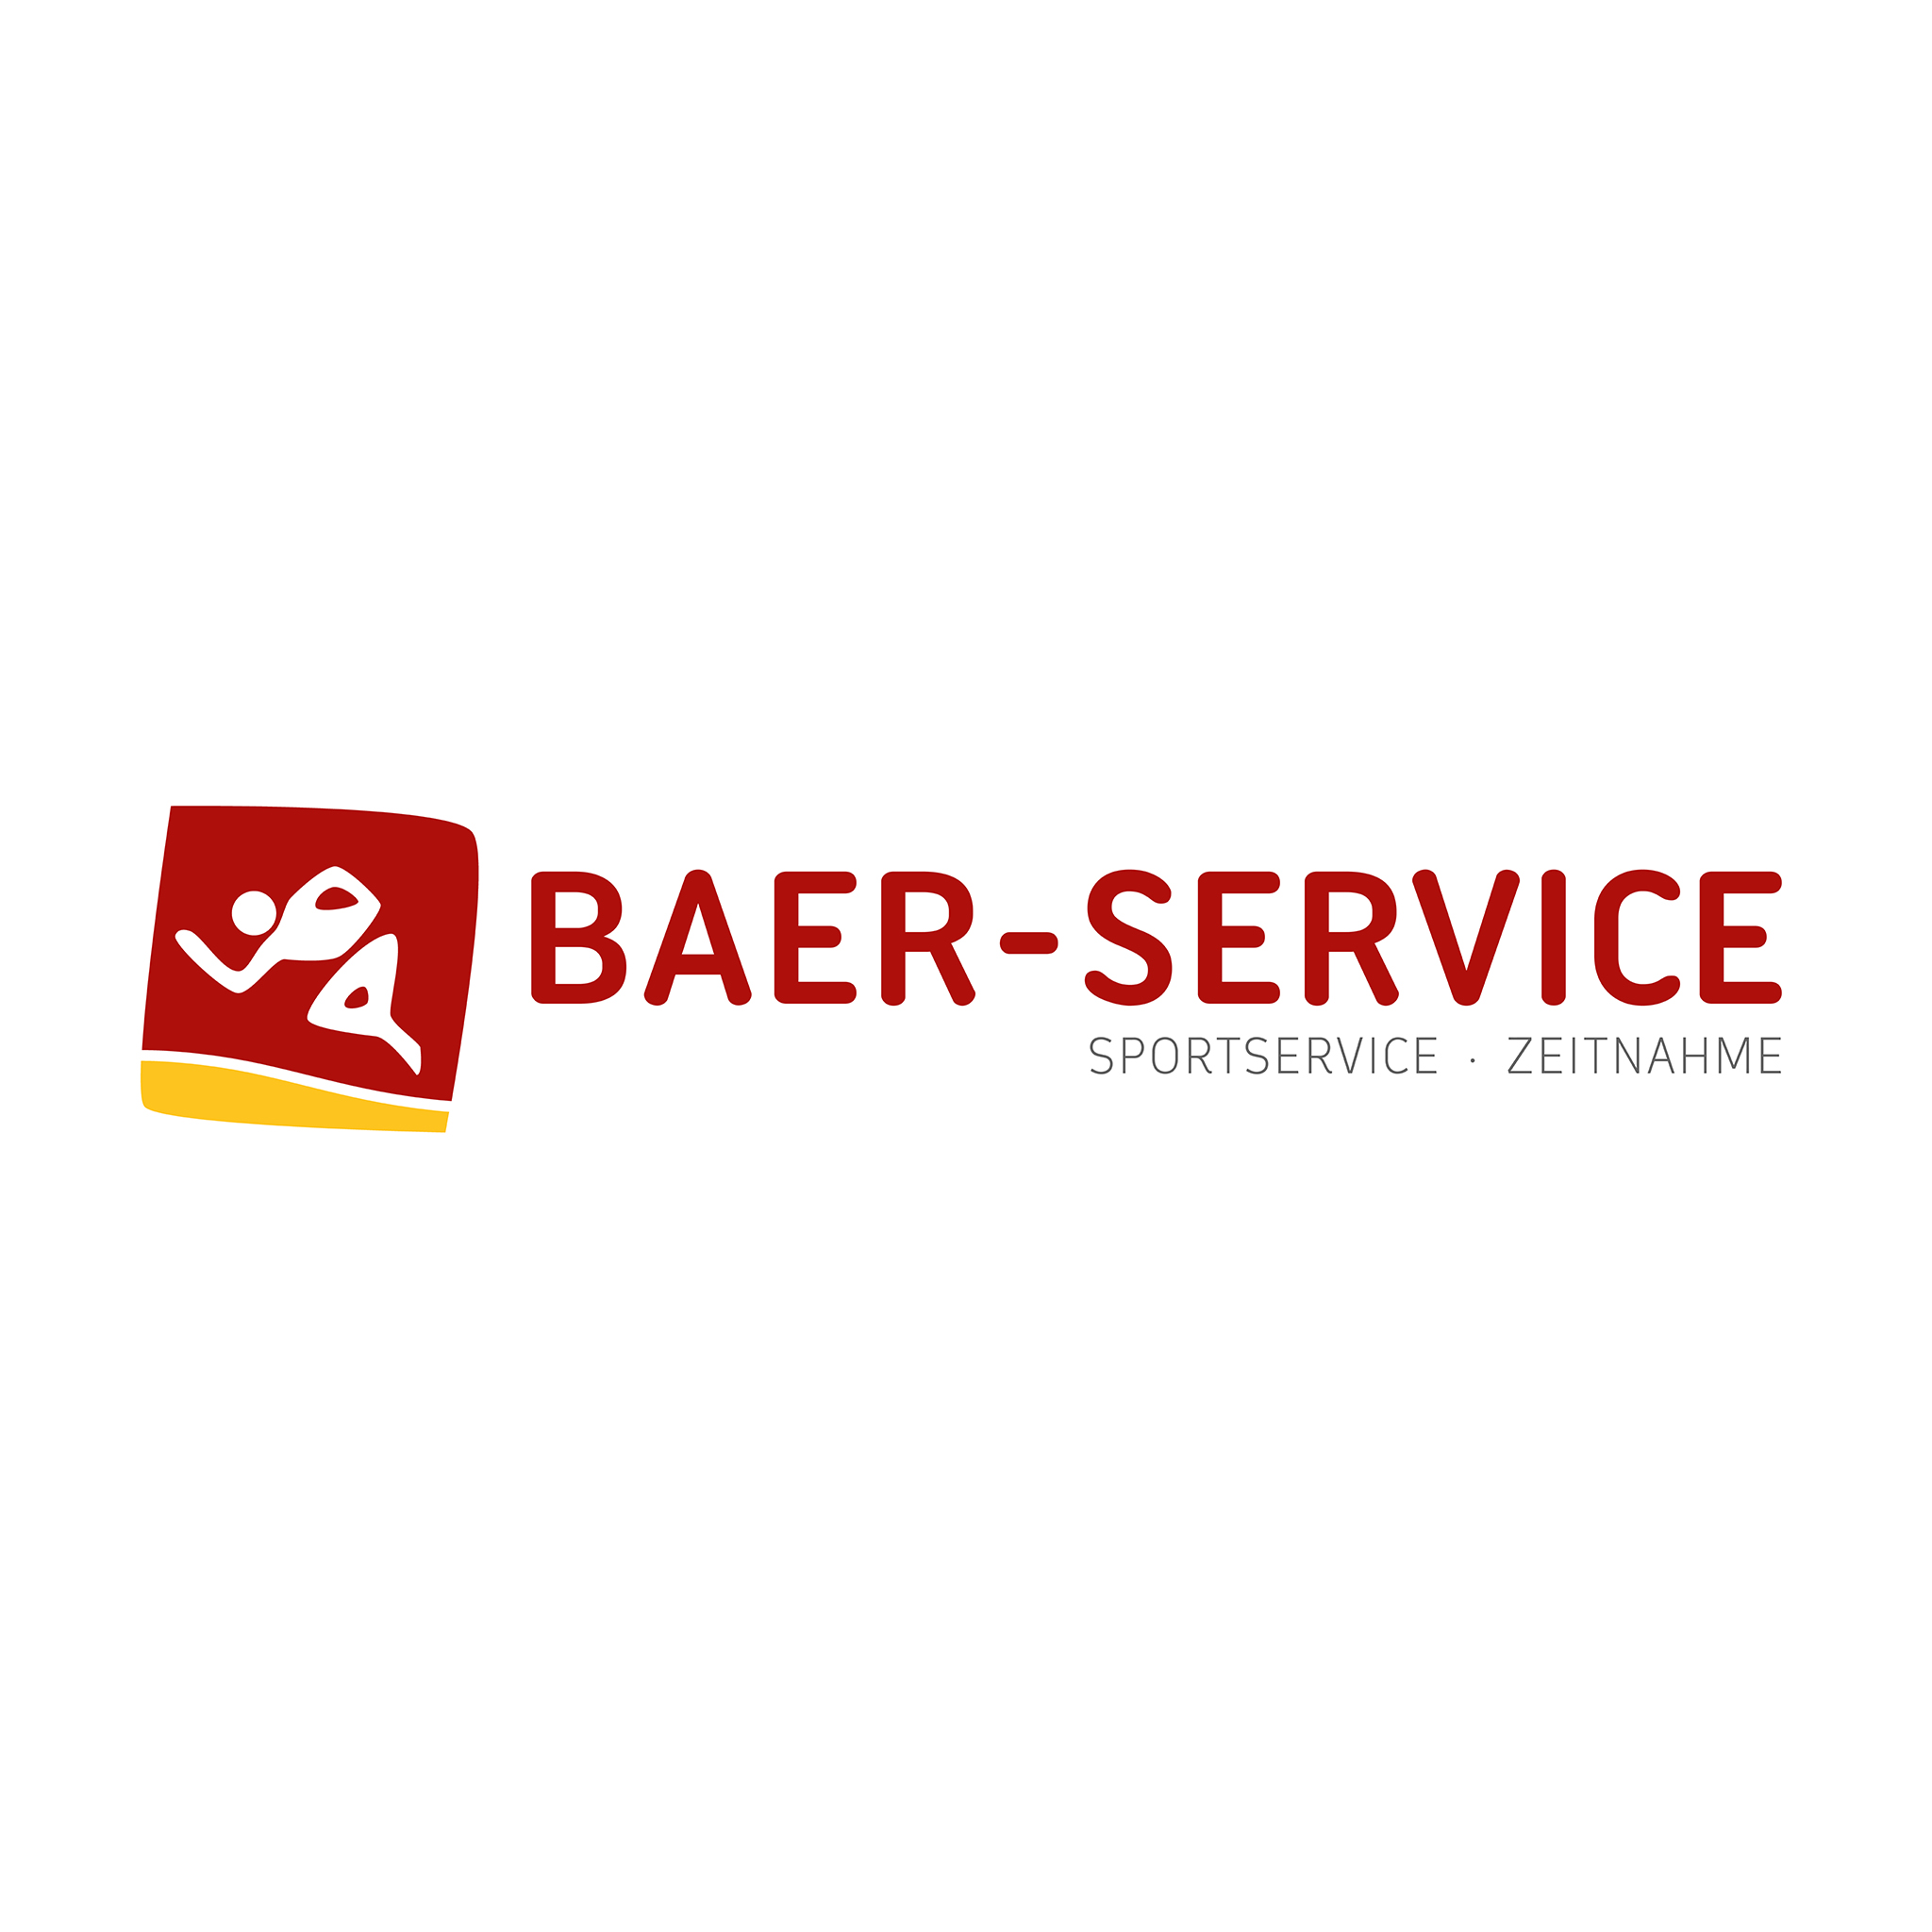 Baer-Service